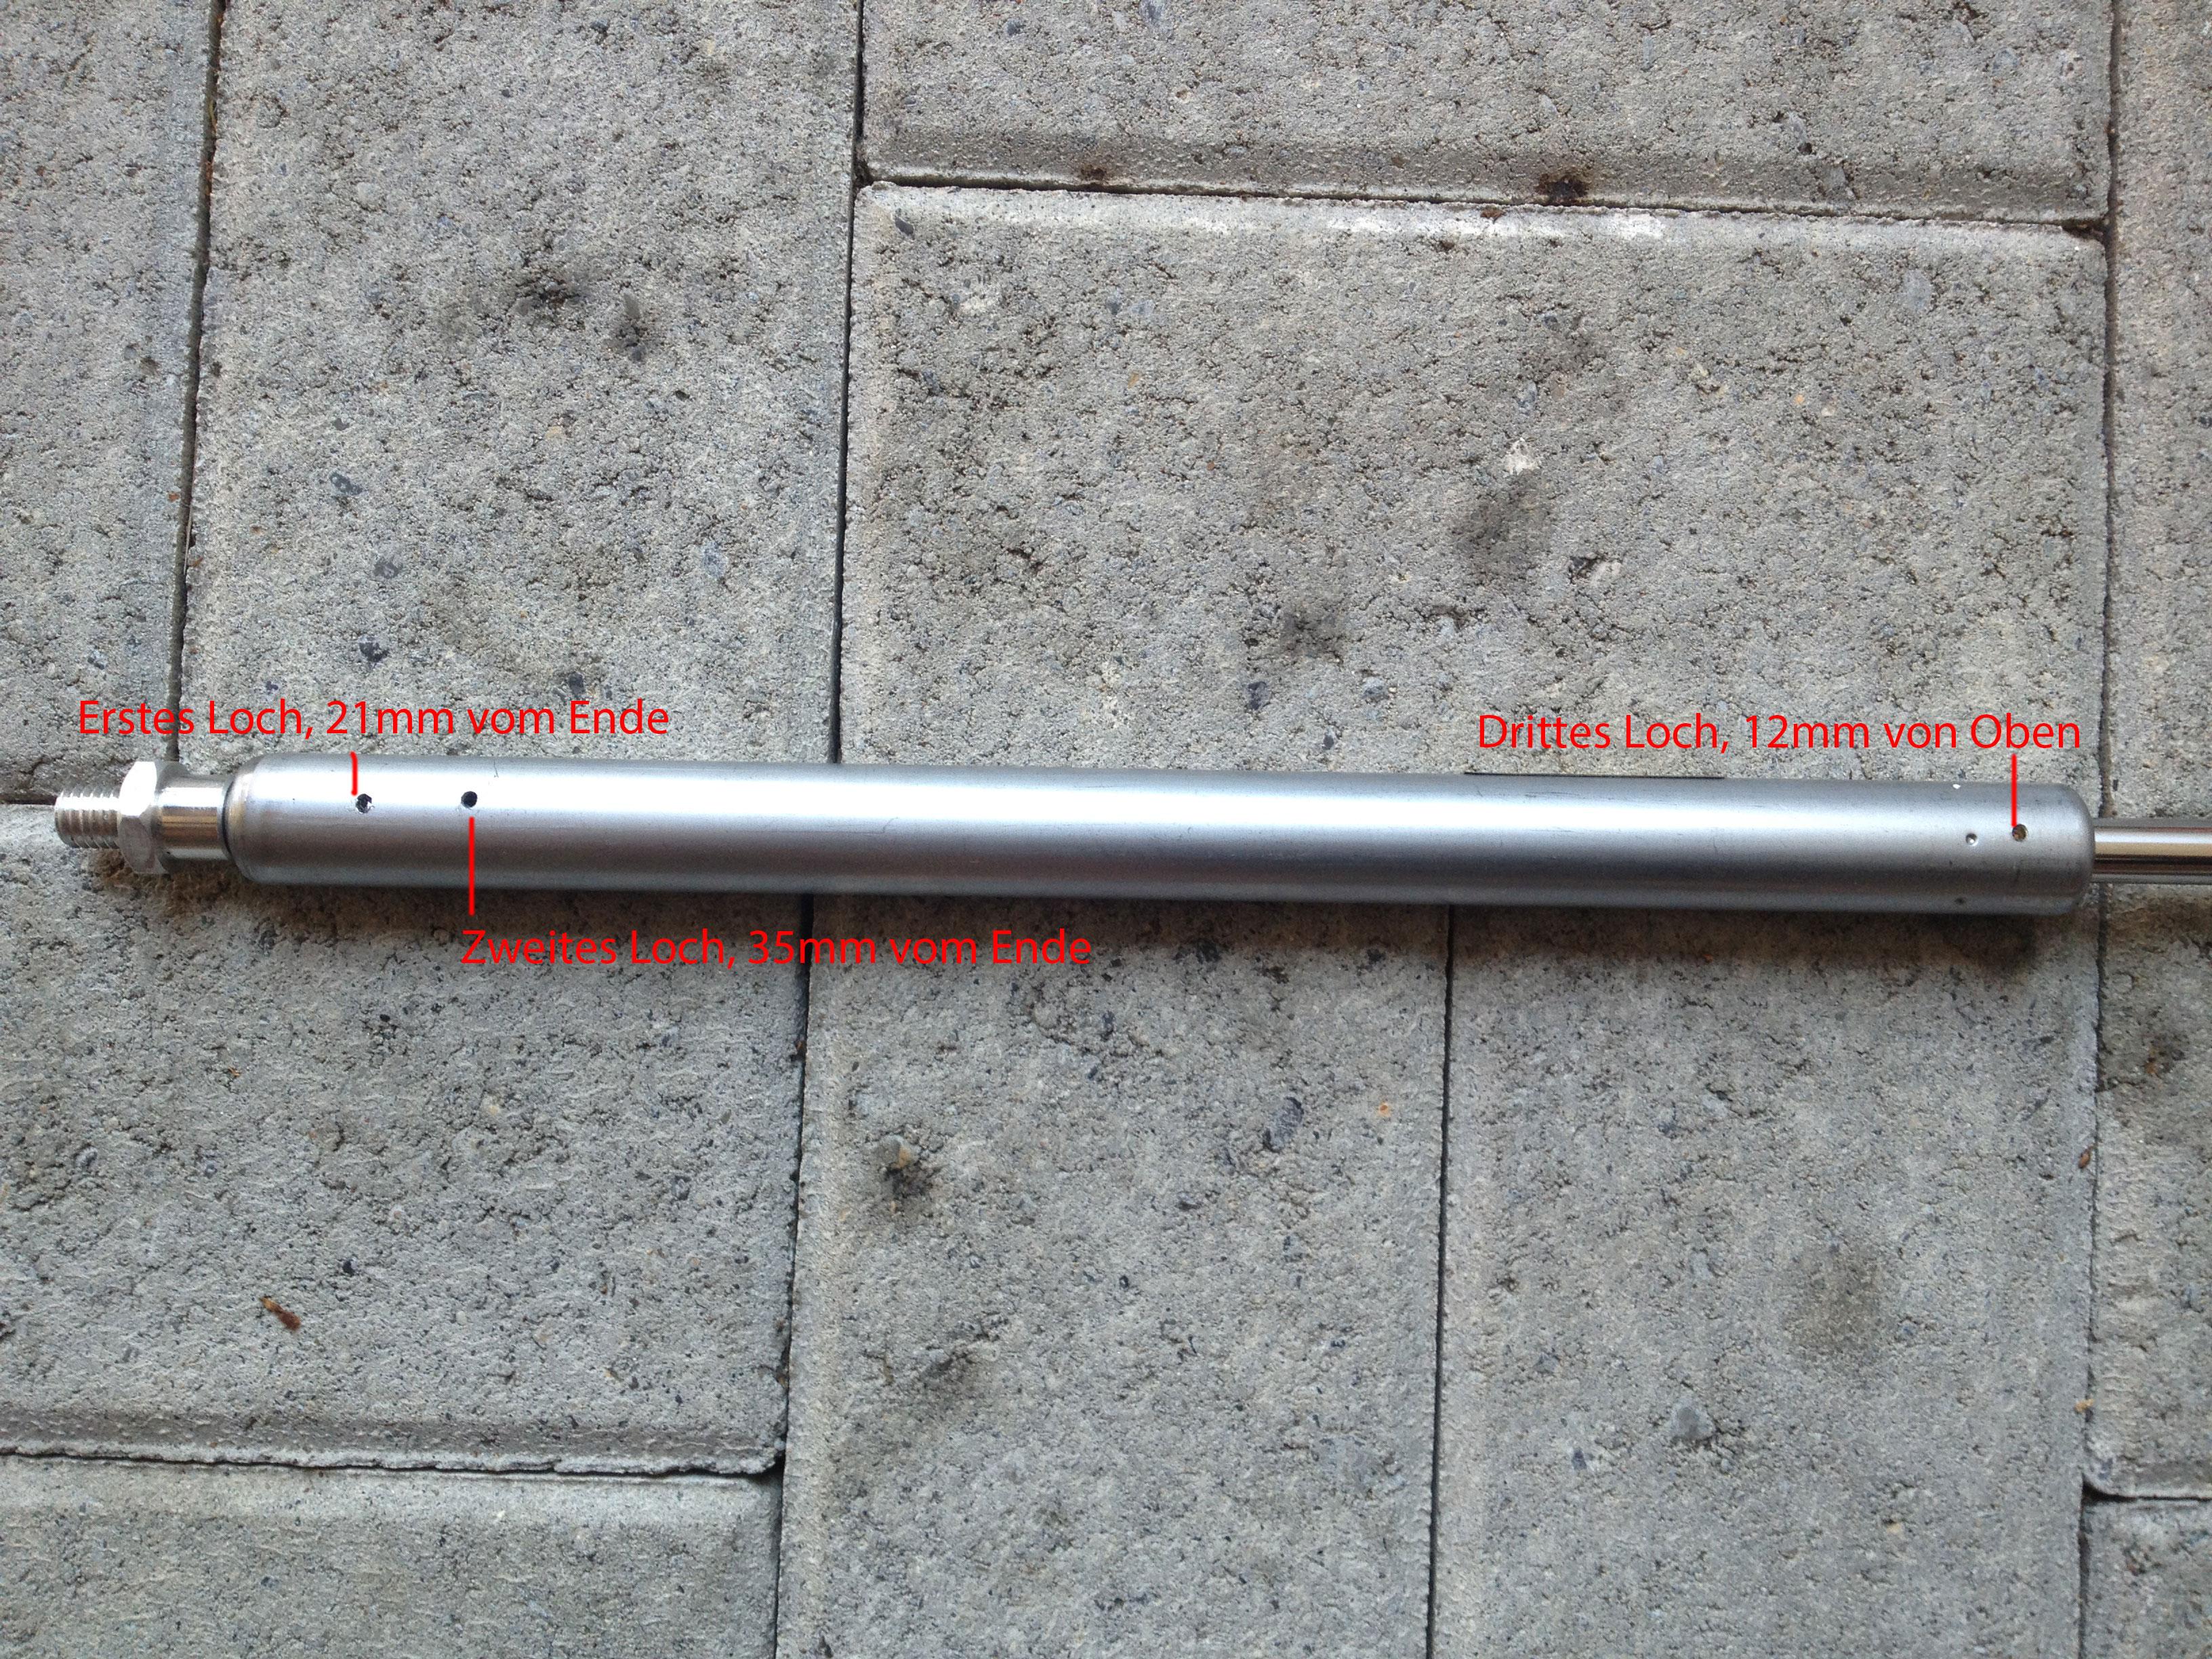 Marzocchi 55 2008 - Federweg ausnutzen - Dämpferkartusche Zugstufe links